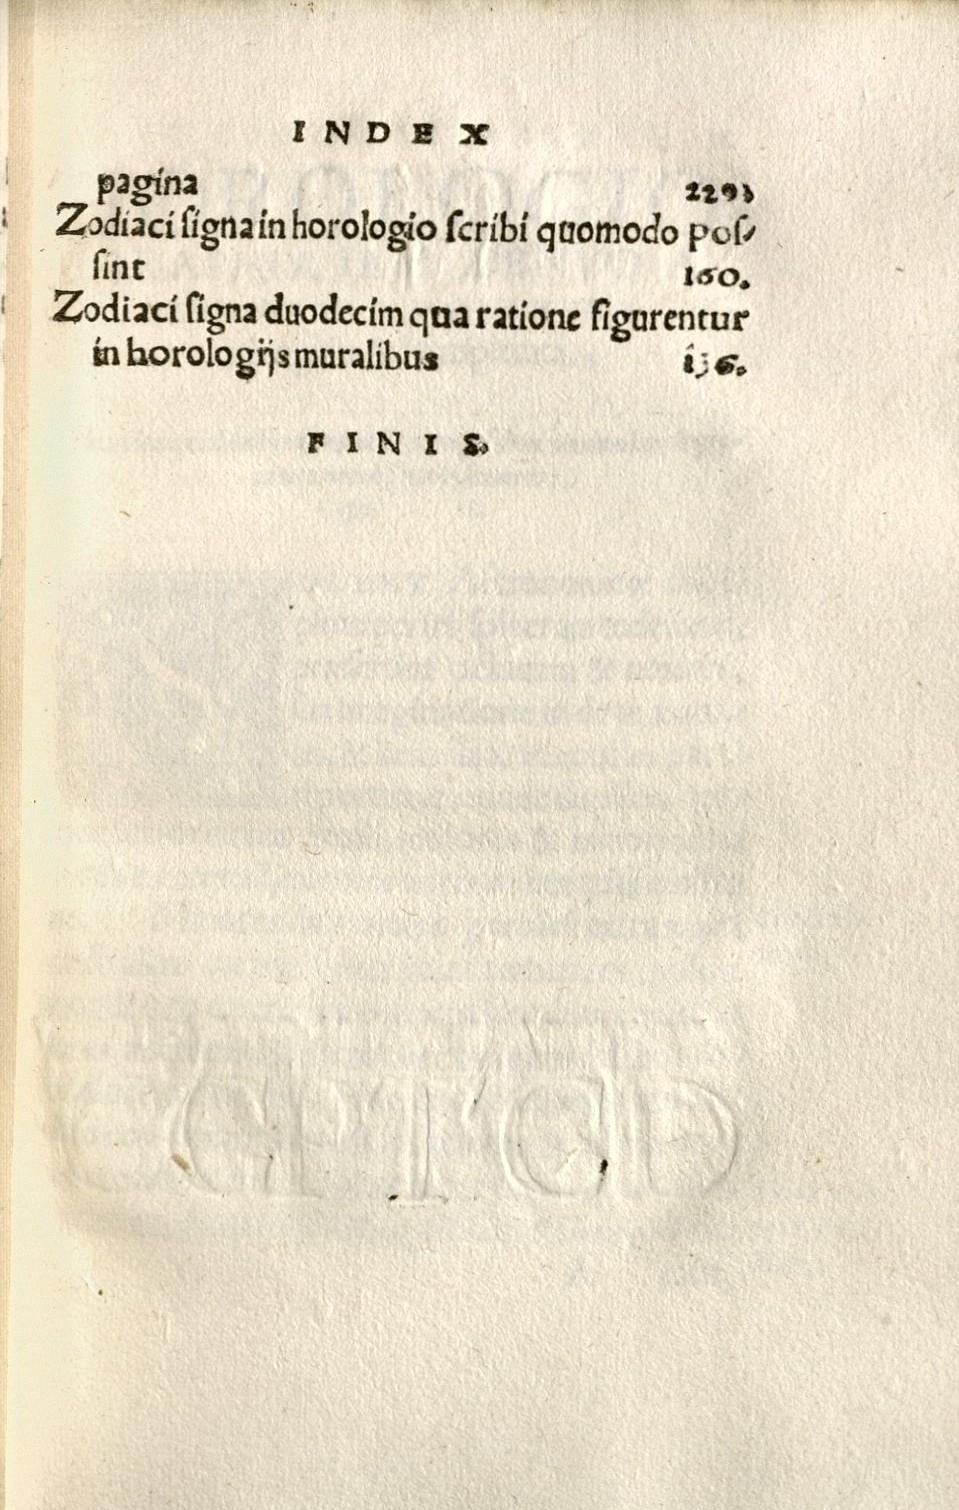 Münster, Sebastian, 1489-1552. Horologiographia. Typ 565.33.584 (B)